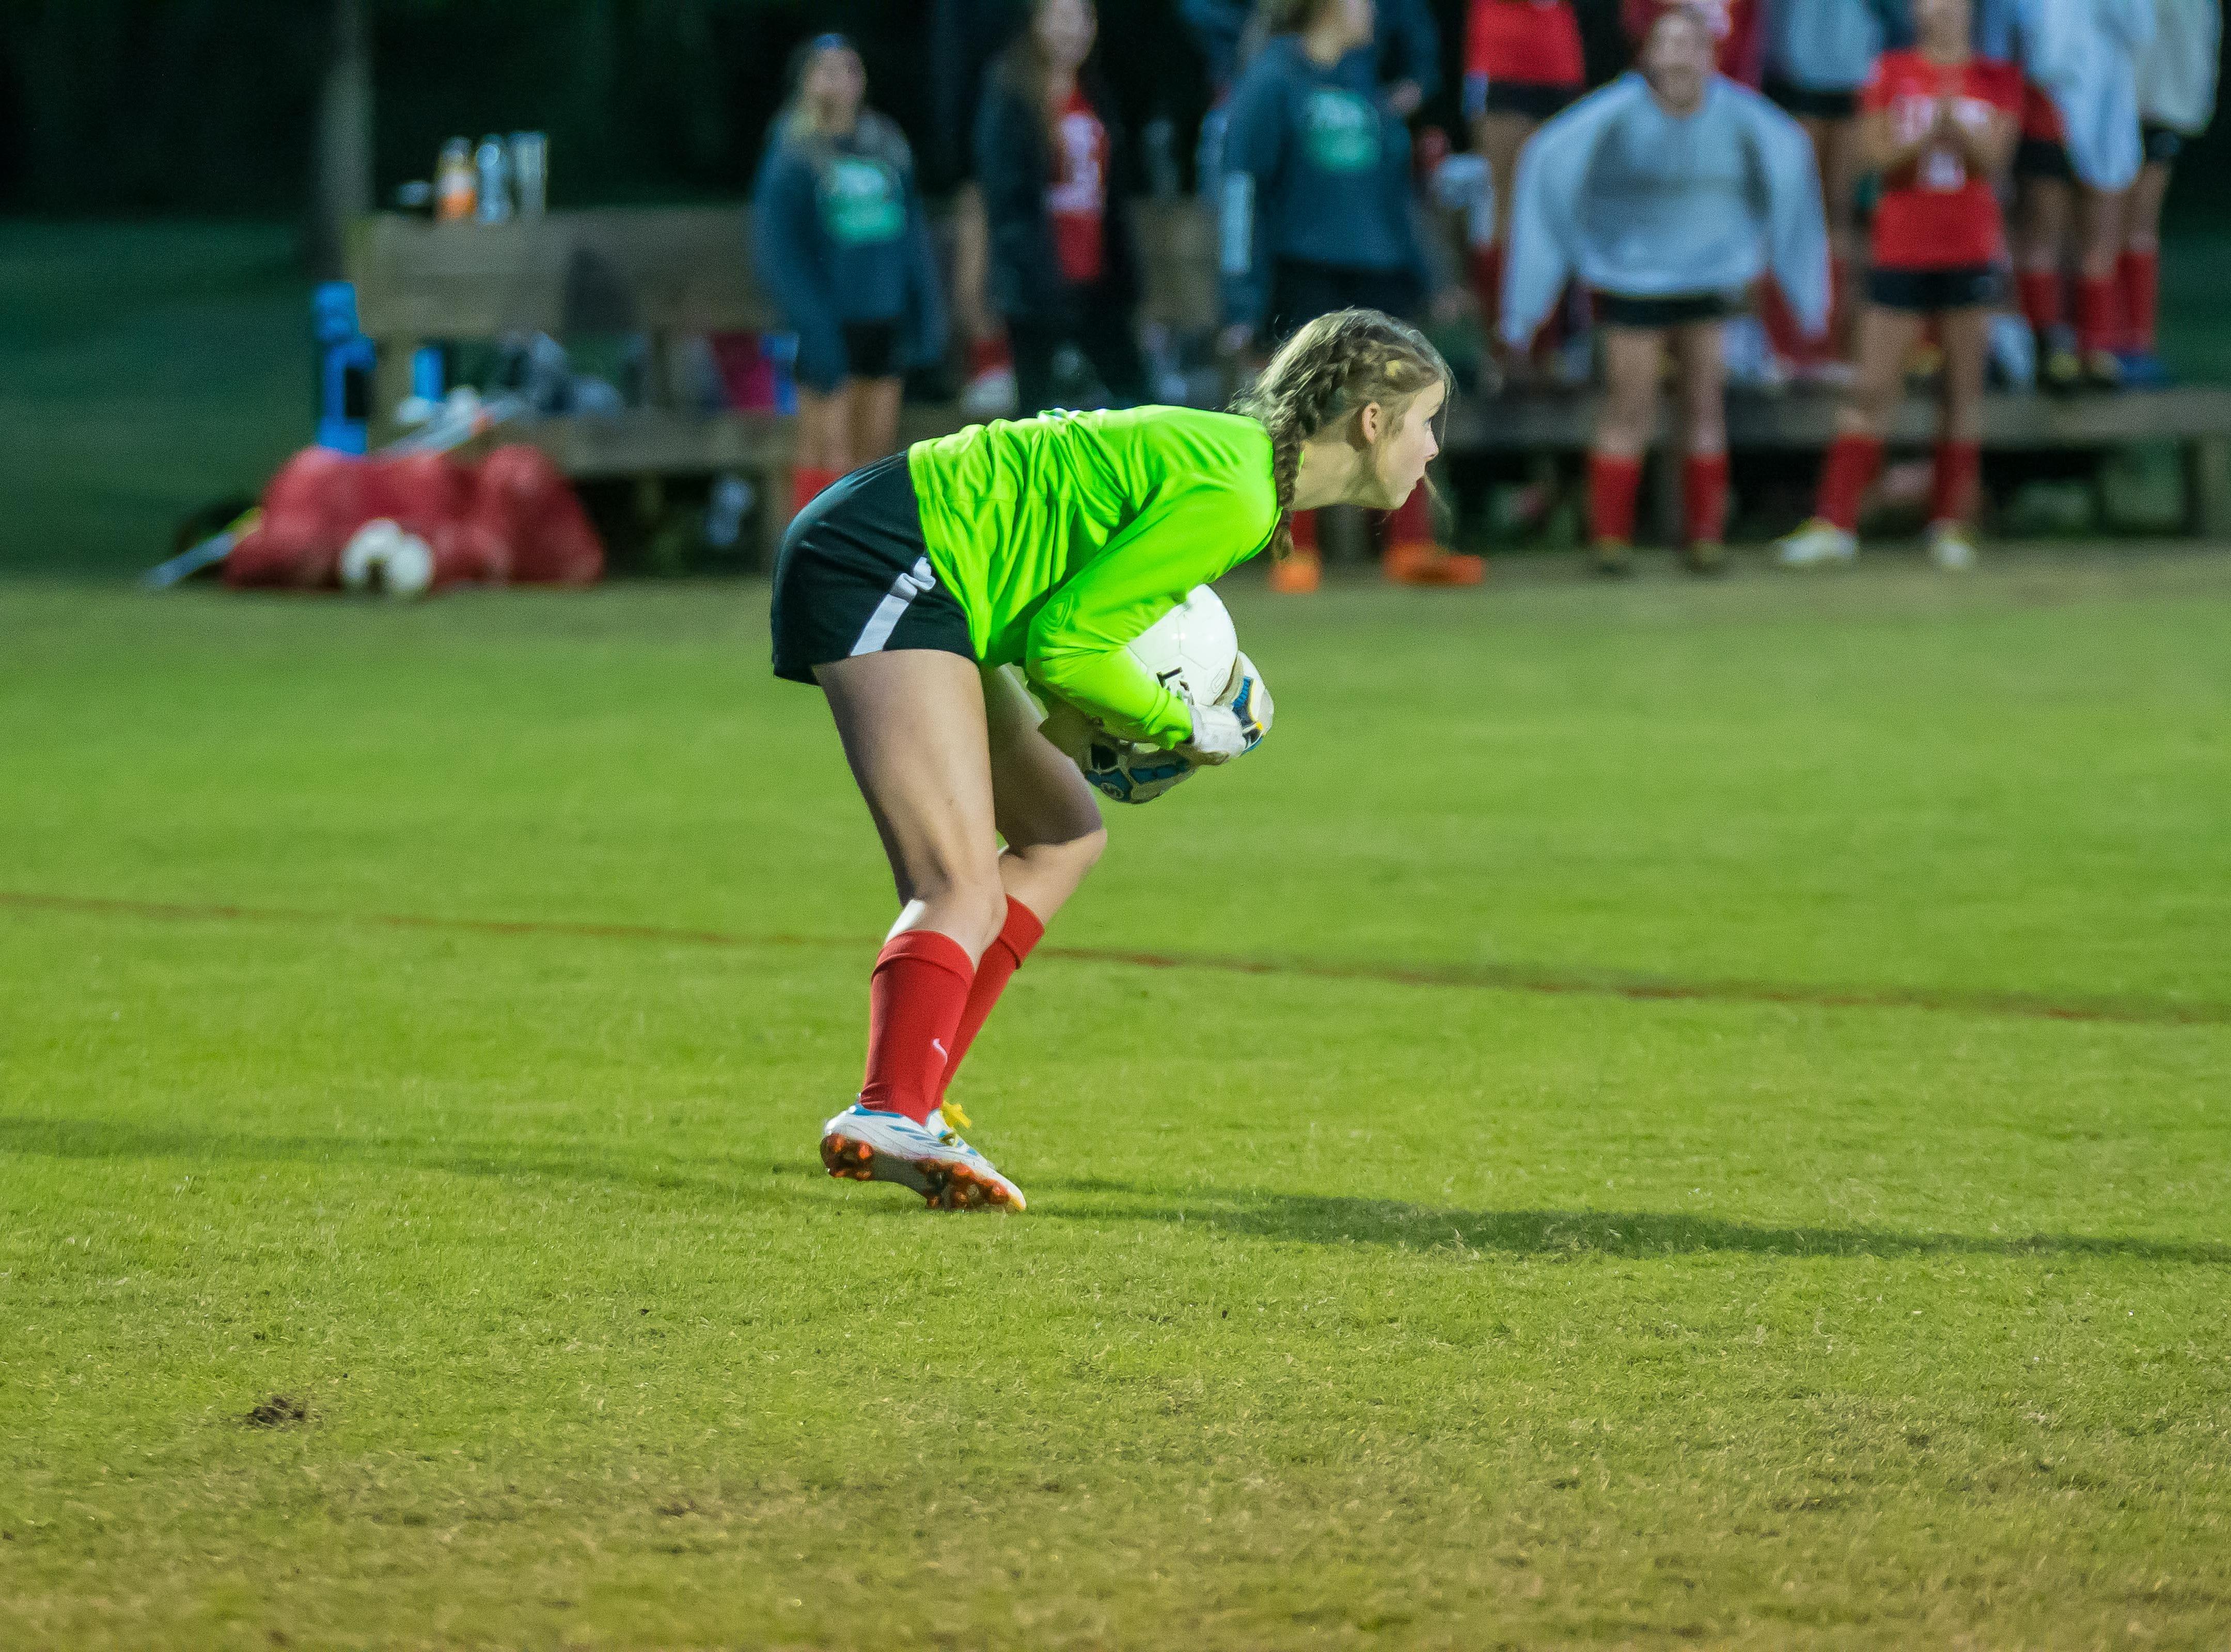 Grace Christian's Carlie Mason stops a shot.